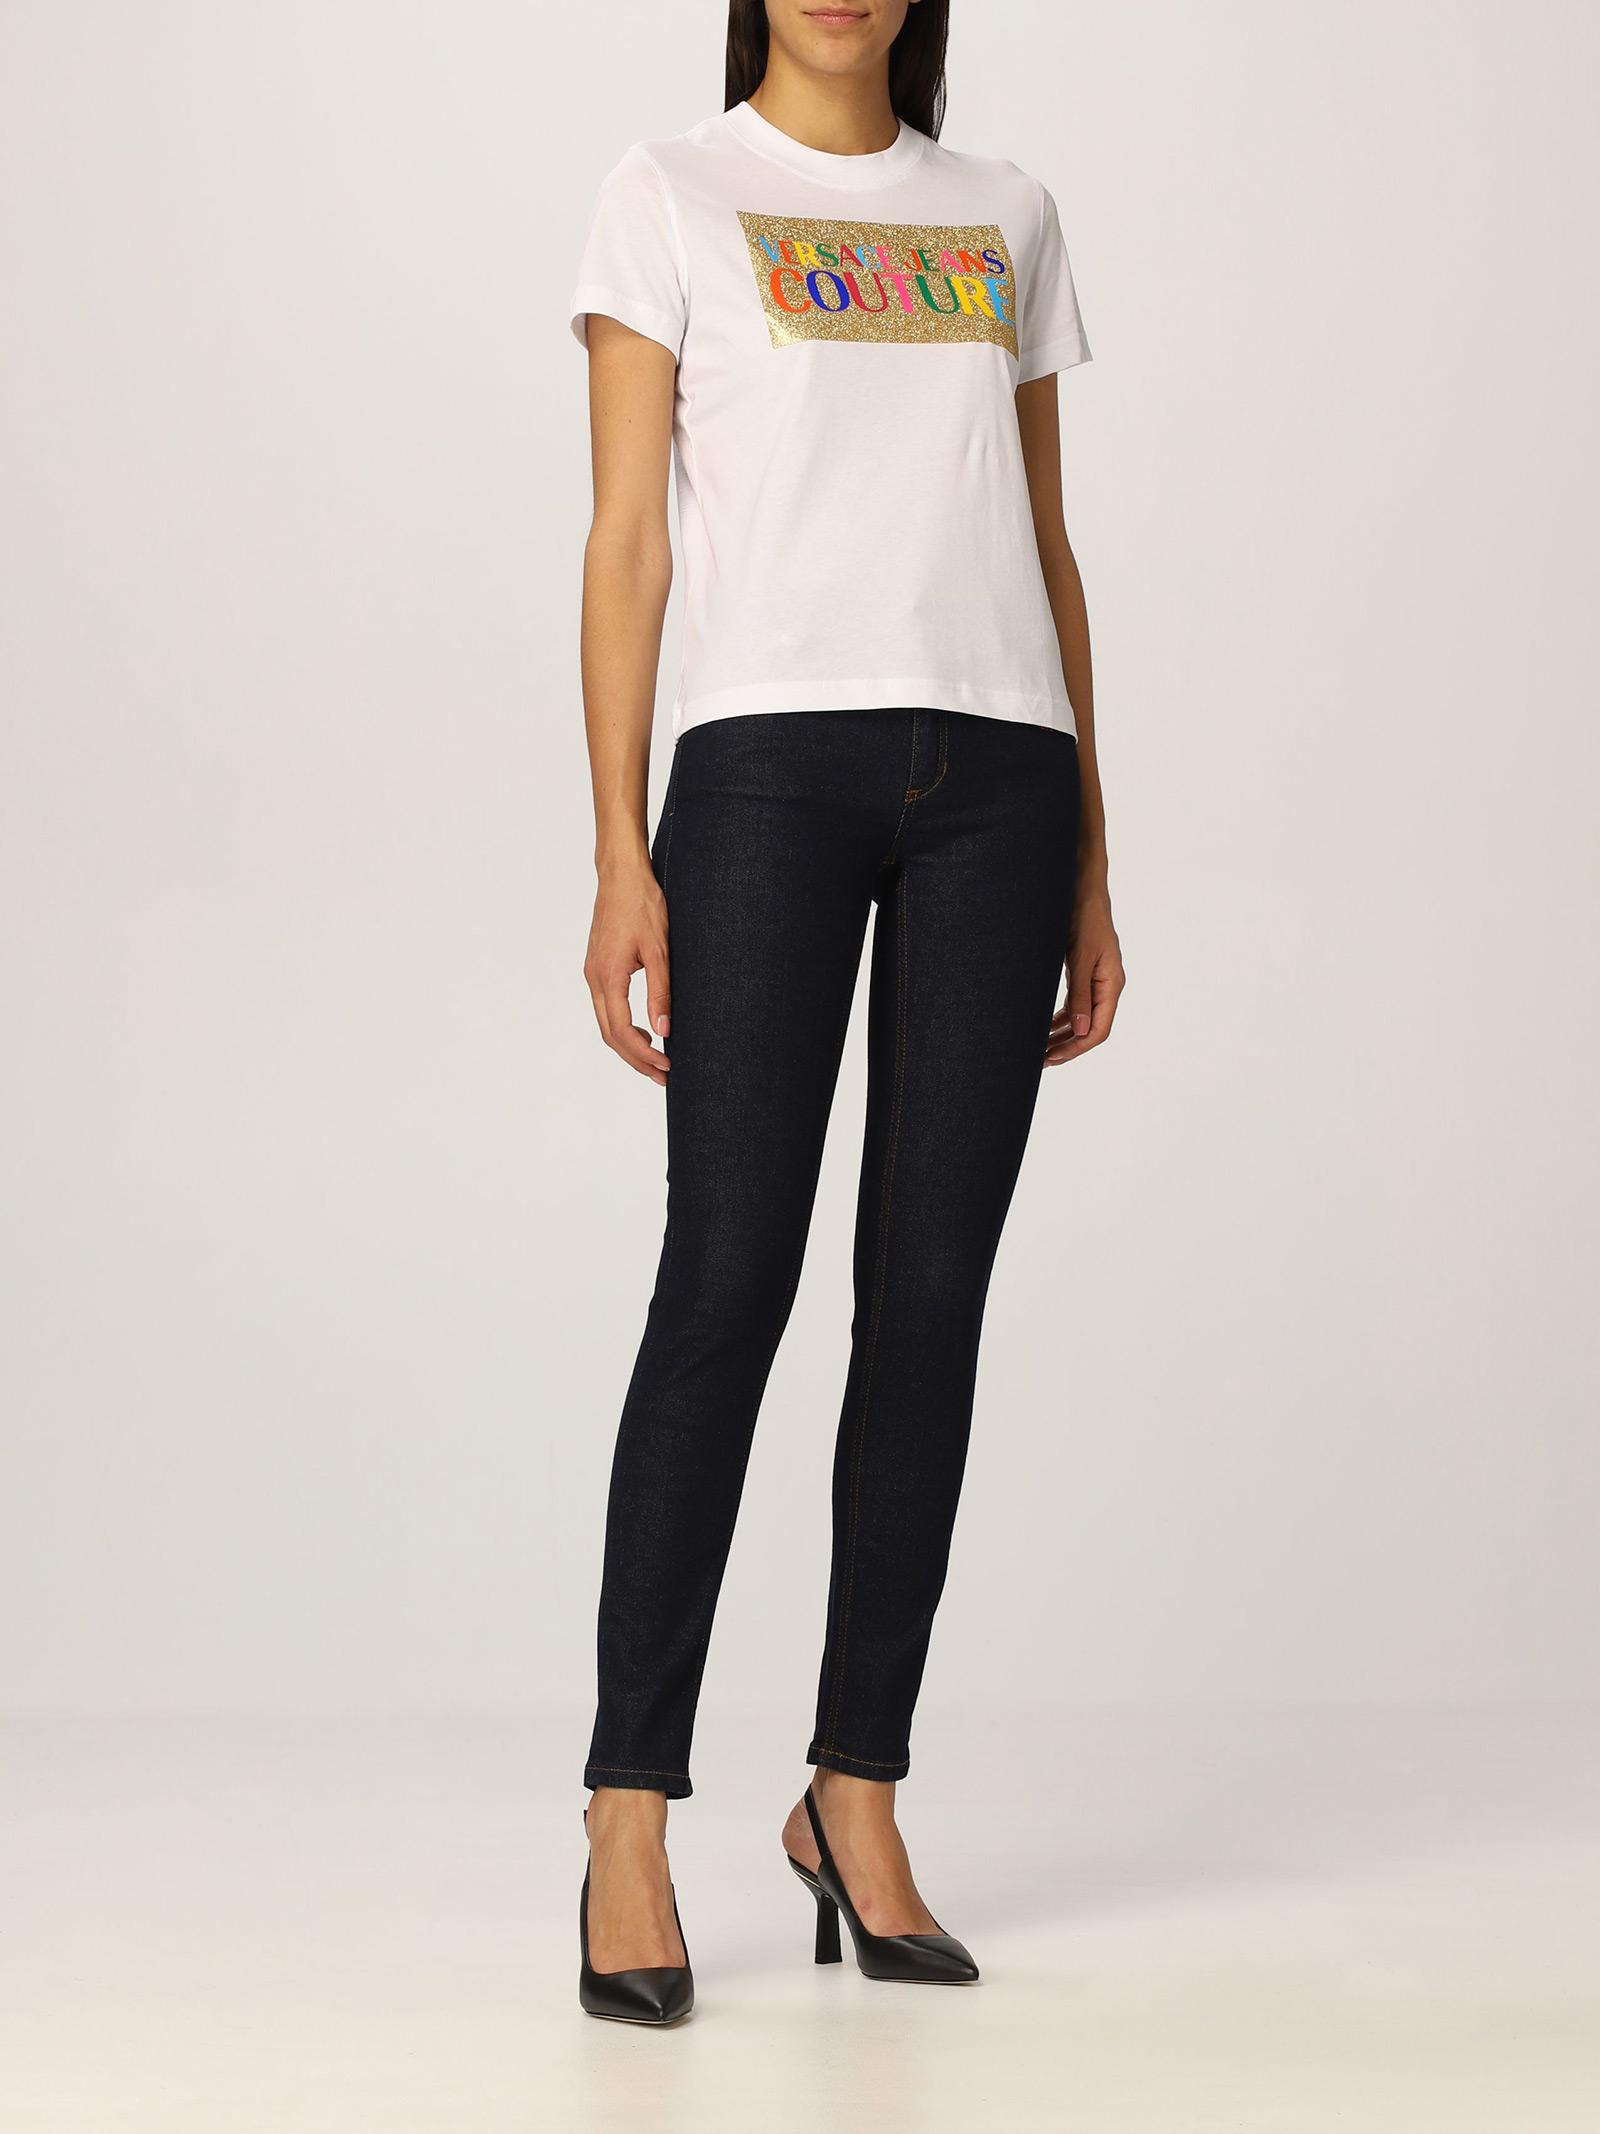 T-shirt glitter multicolor  VERSACE JEANS | T-Shirts | 71HAHT07003